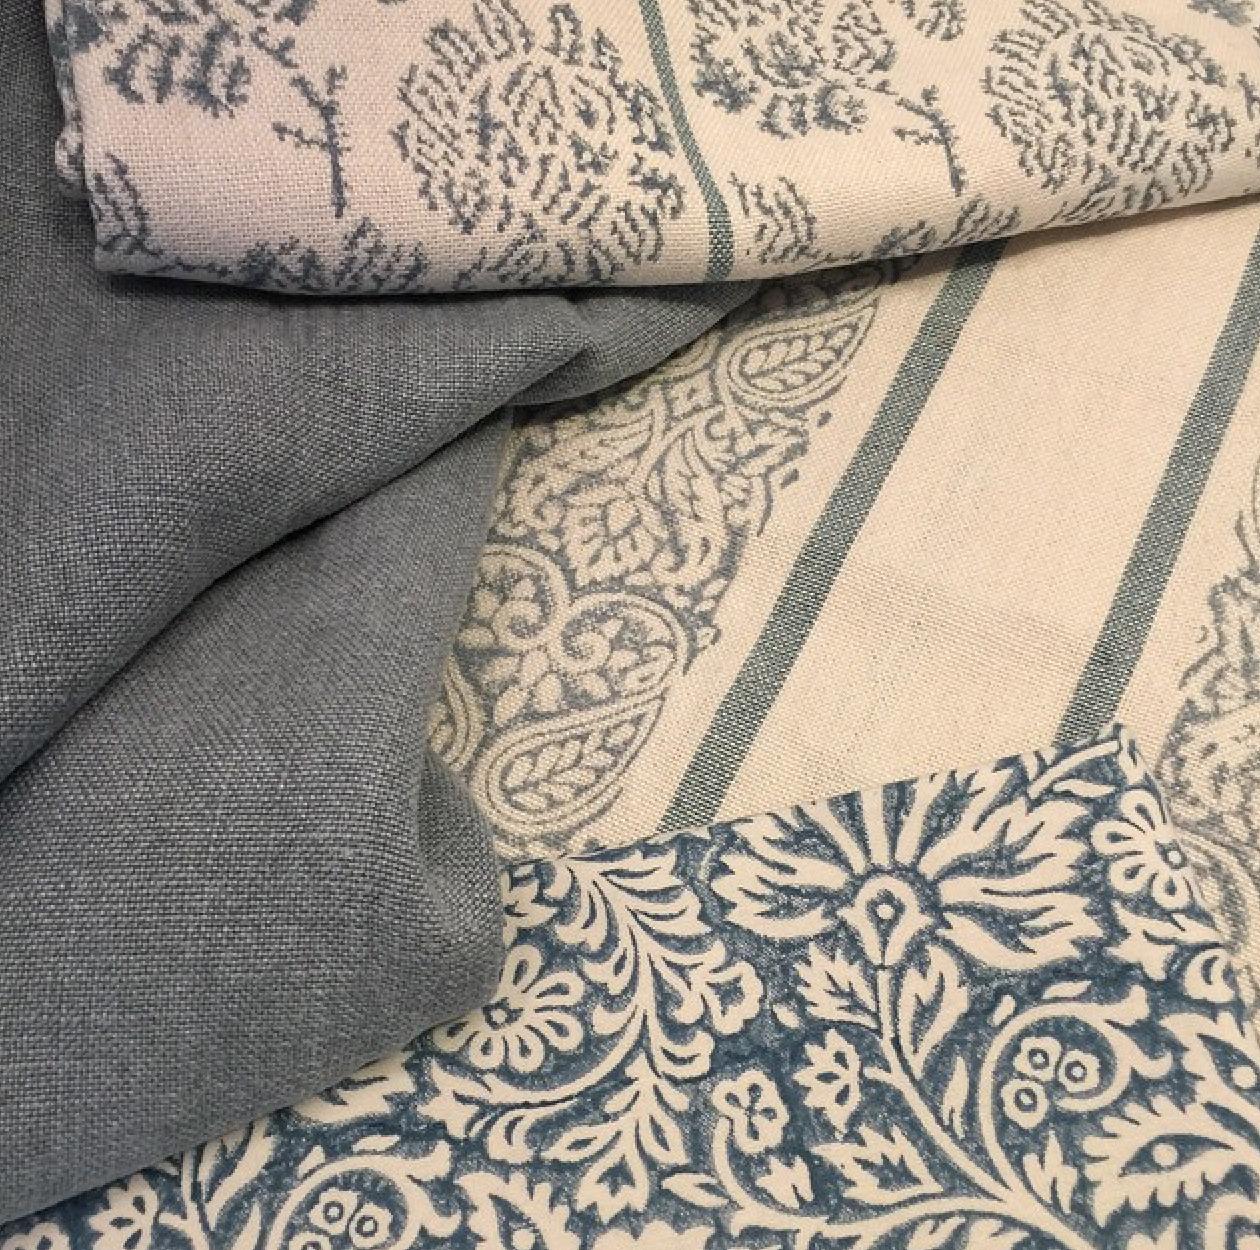 Fabrics-from-the-Artisan-Collection-by-GP-J-Baker-stiltyger-wallpaper-wp5805507